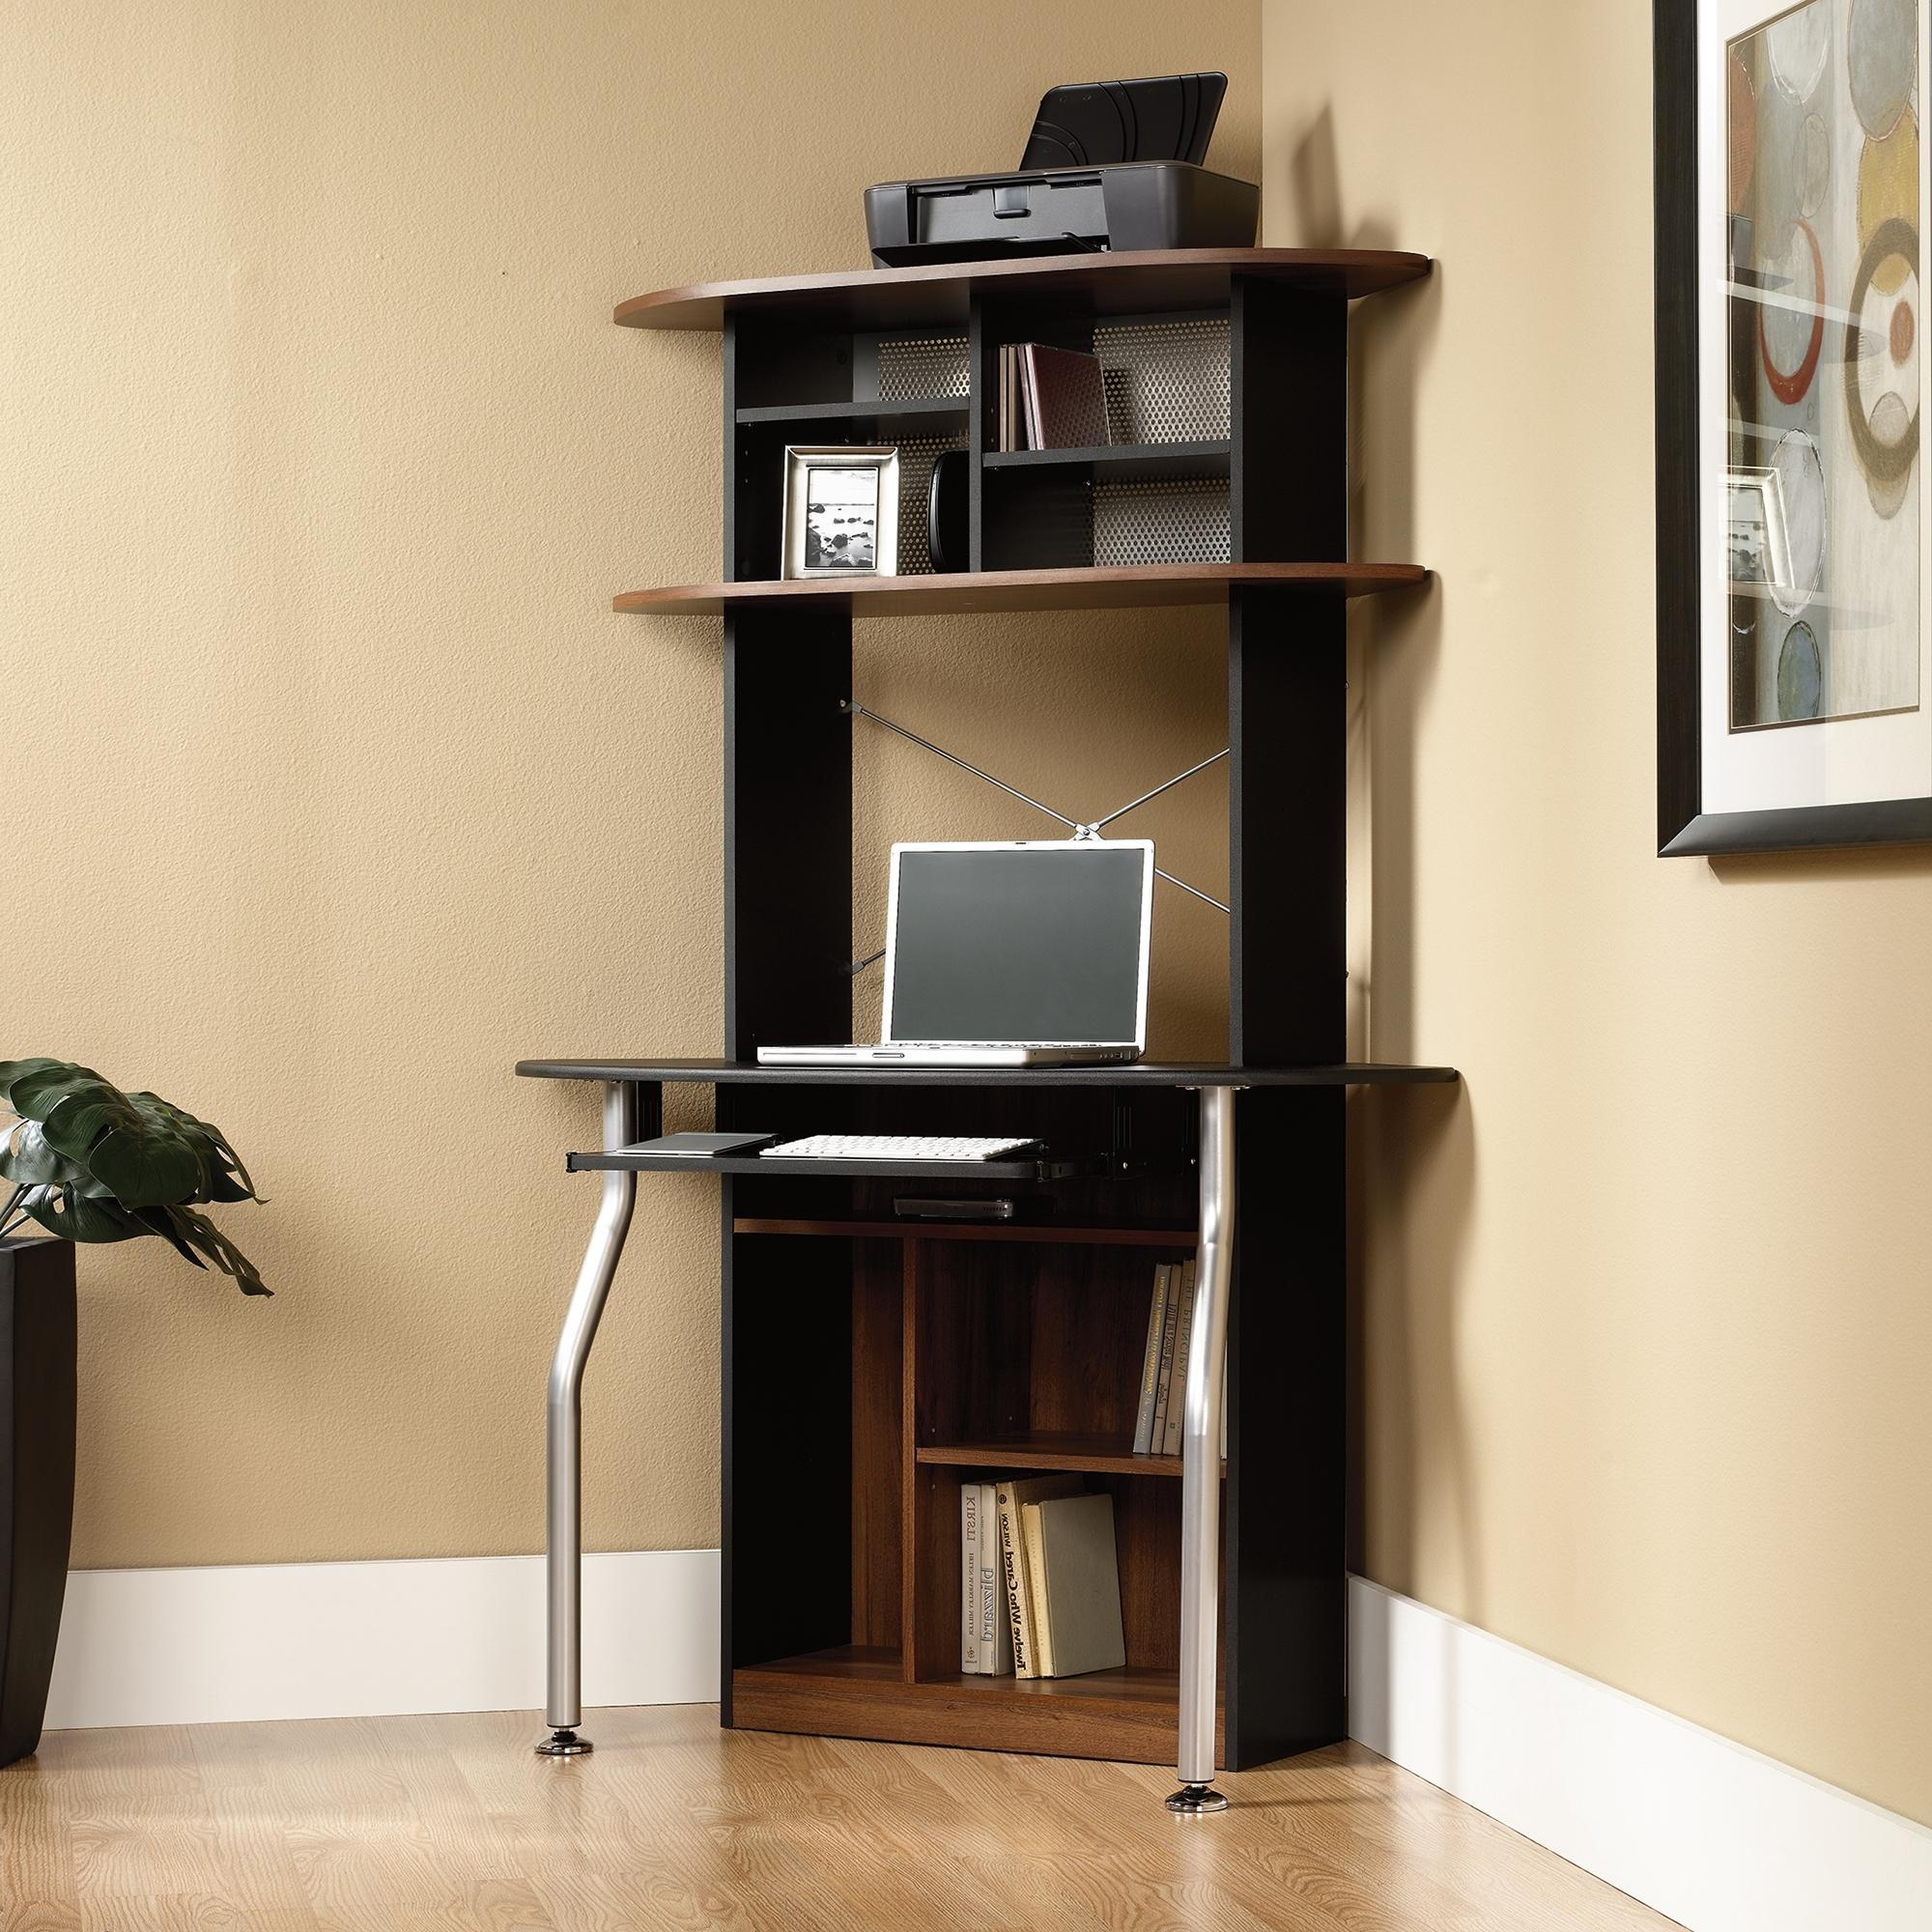 Vertical Computer Desks Intended For Trendy Furniture : Modern Corner Computer Desk Look Elegant Minimalist (View 15 of 20)